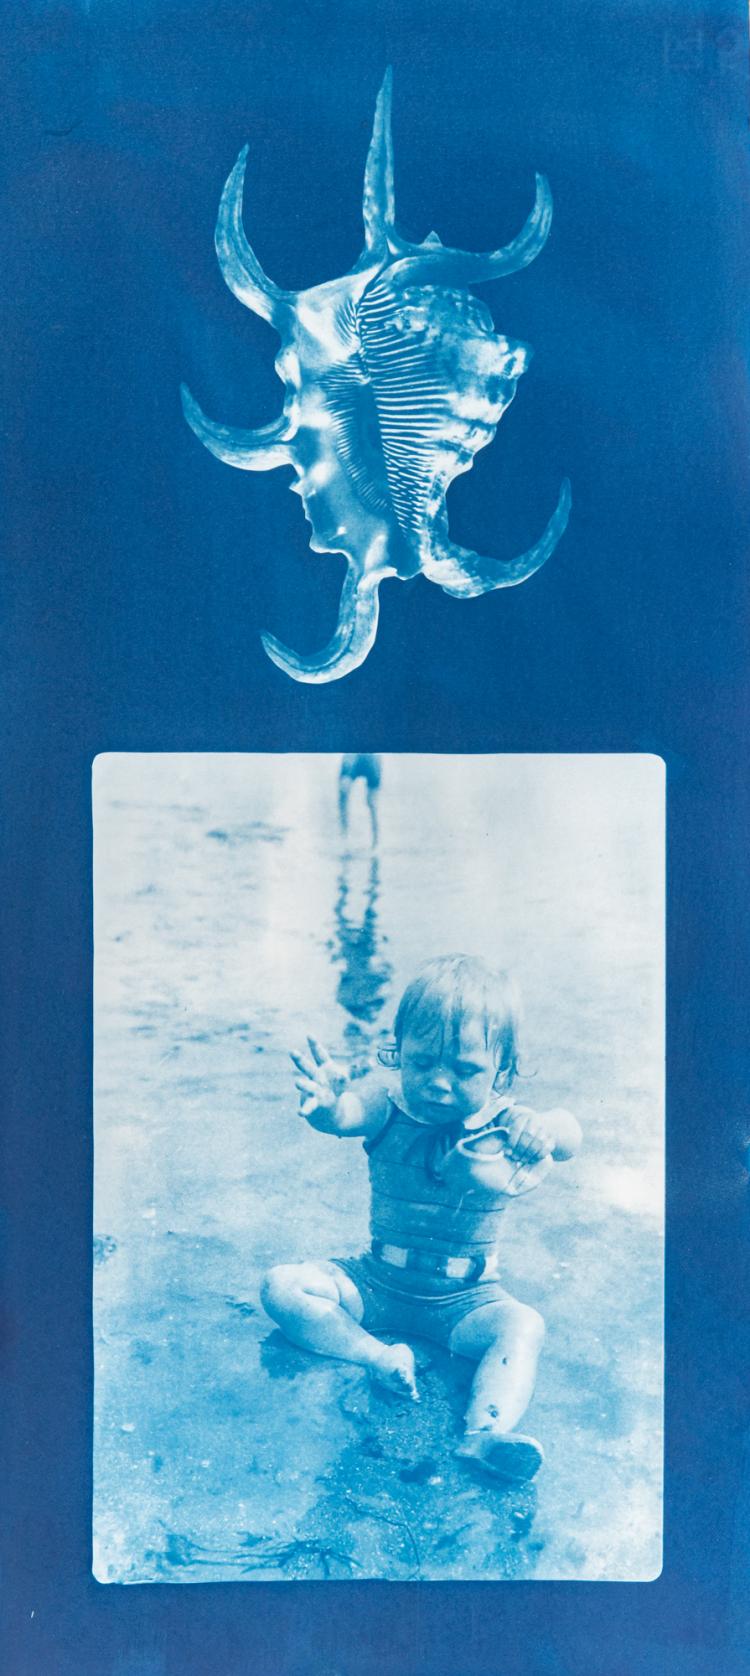 Bathing boy with conch 1/4 V.E. Cyanotype on Fabriano © Jonathan Brennan, 2020